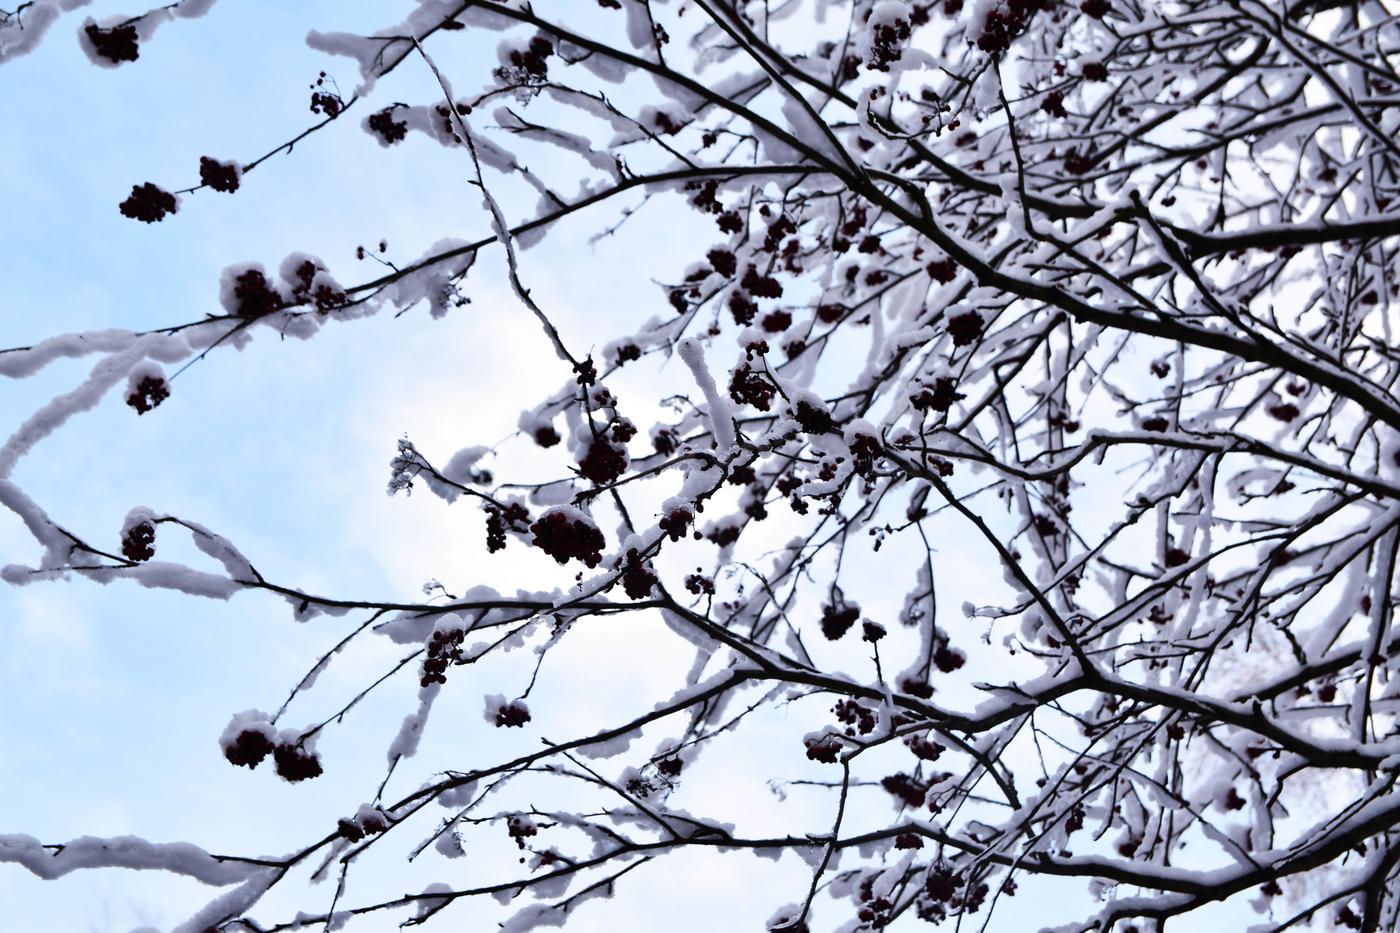 pihlajanmarjat talvi3.jpg